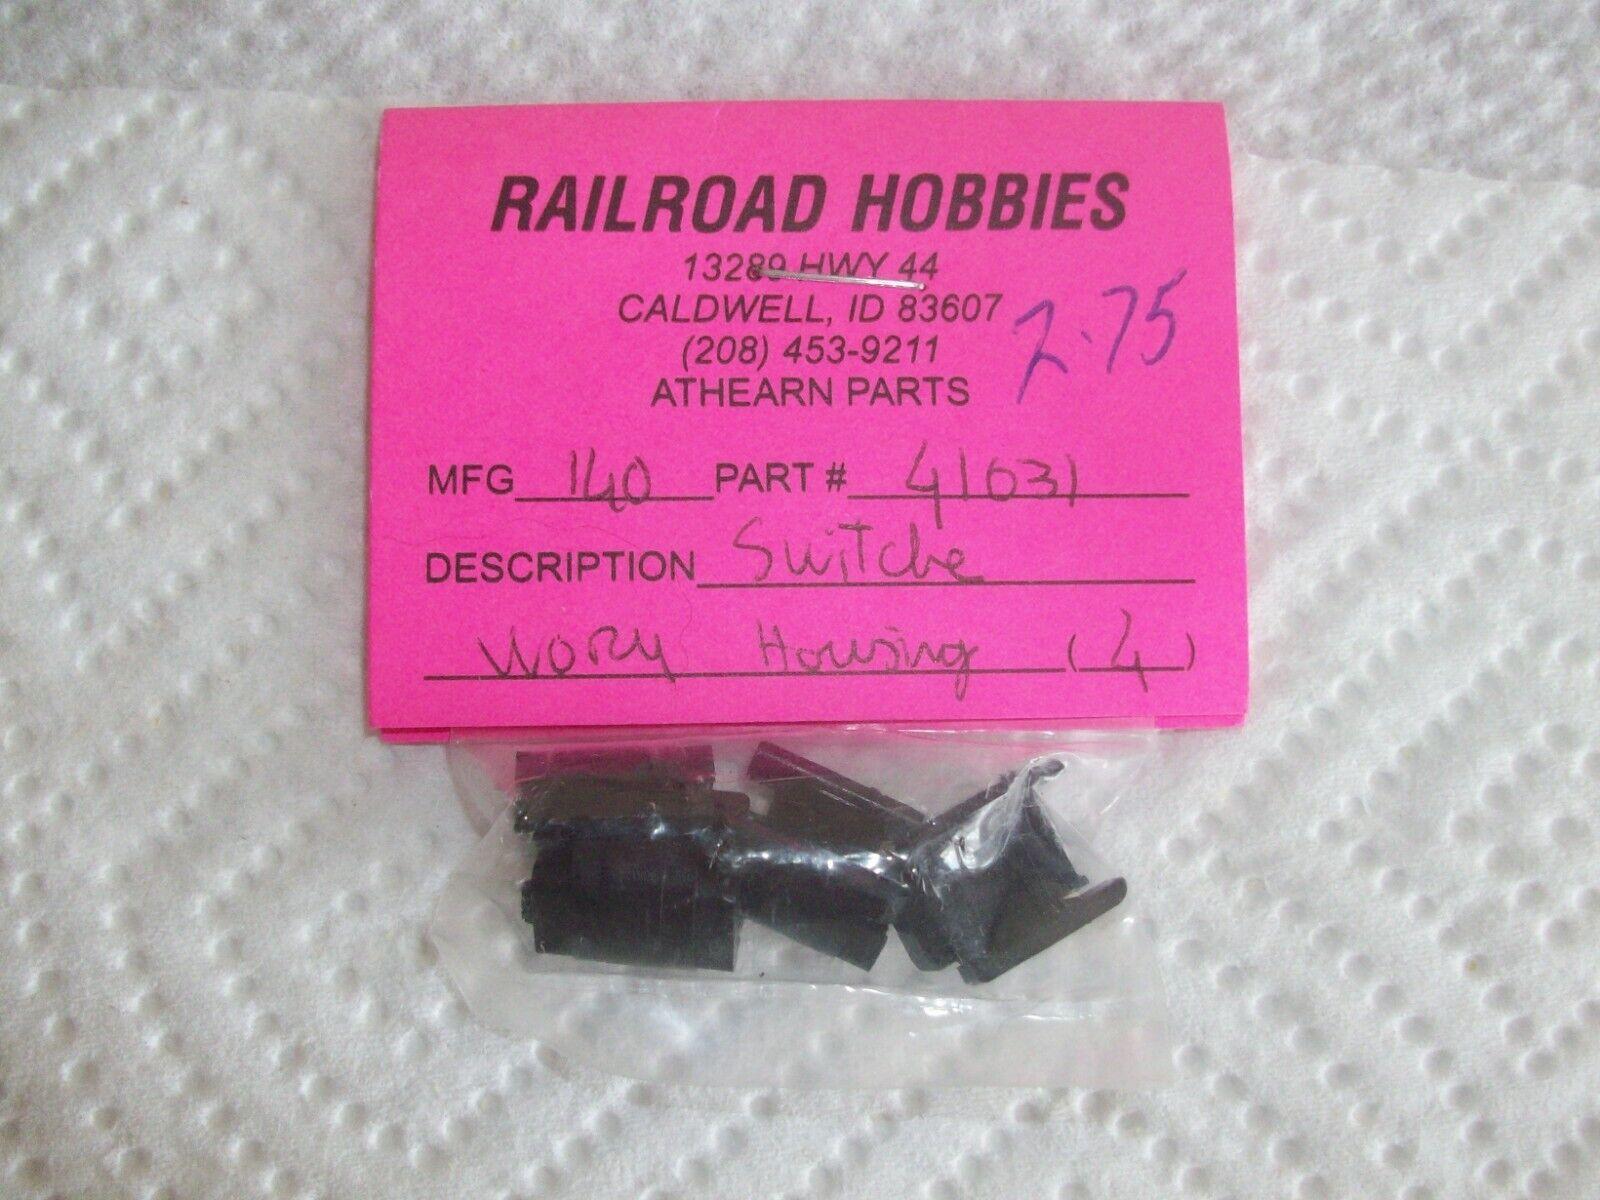 Athearn Blue Box HO Switcher Locomotive Worm Housing 4pc 41031 140-41031 - $3.99